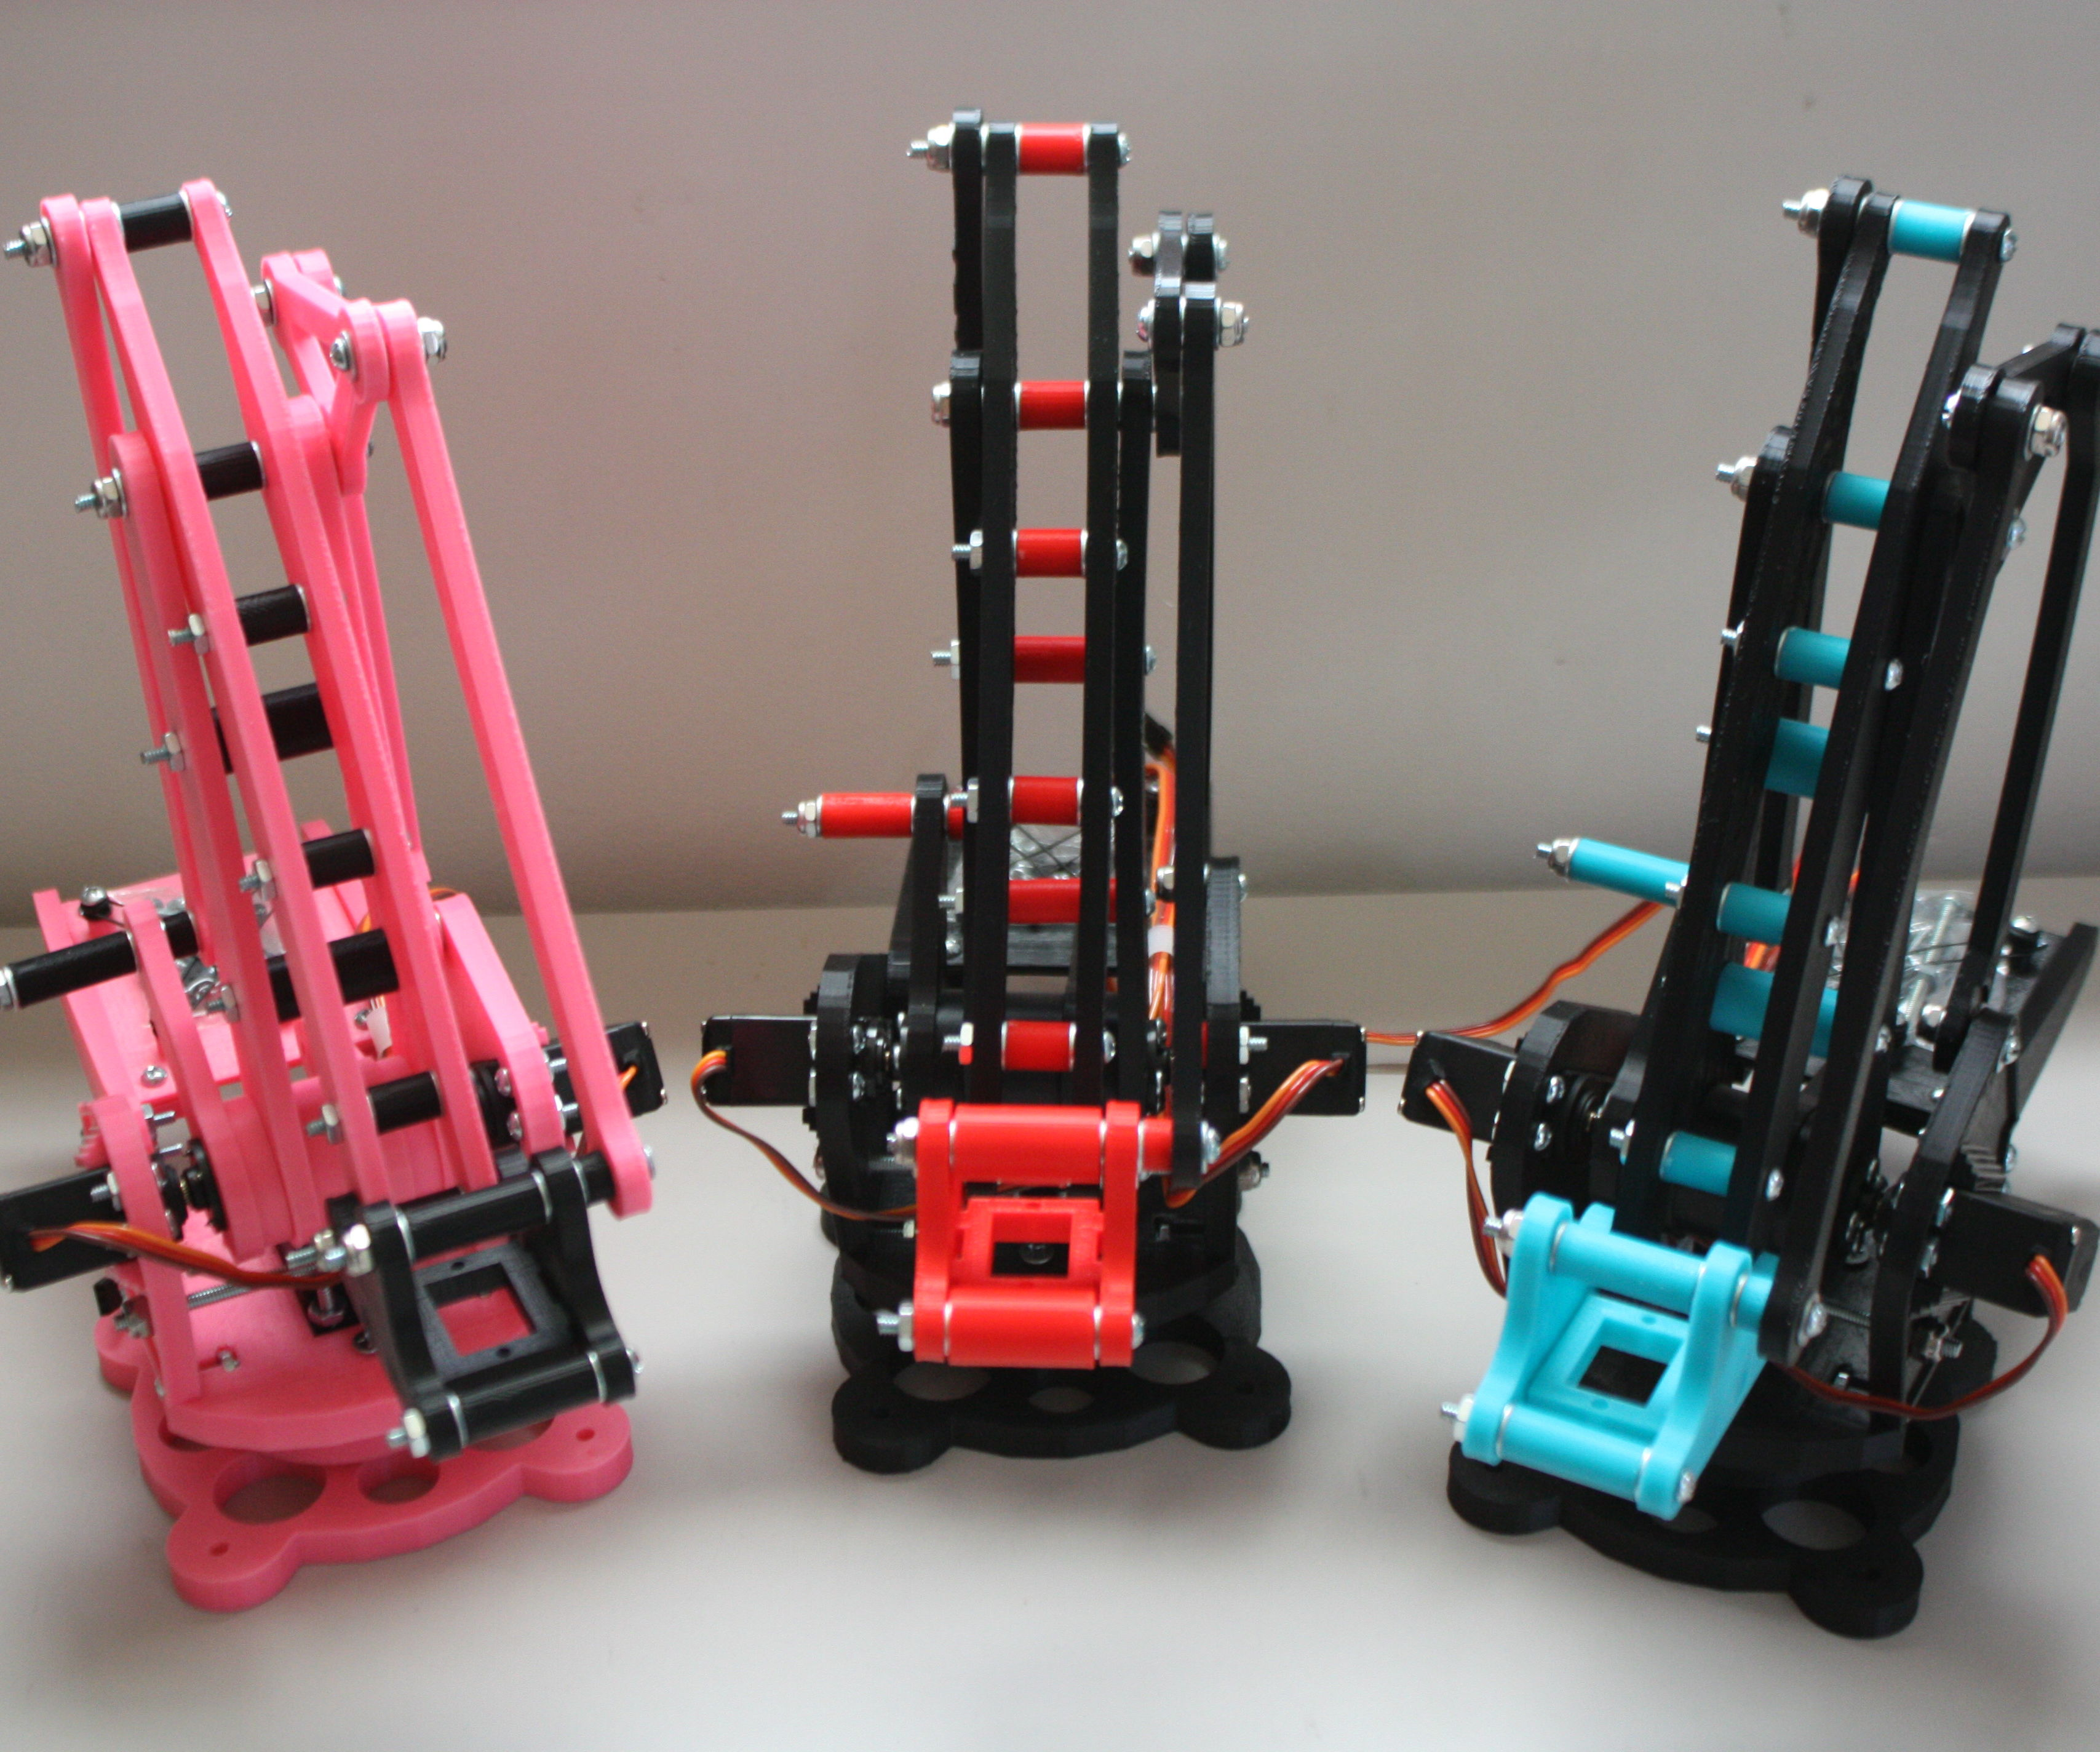 UArm Miniature Palletizing Robot Arm for Arduino